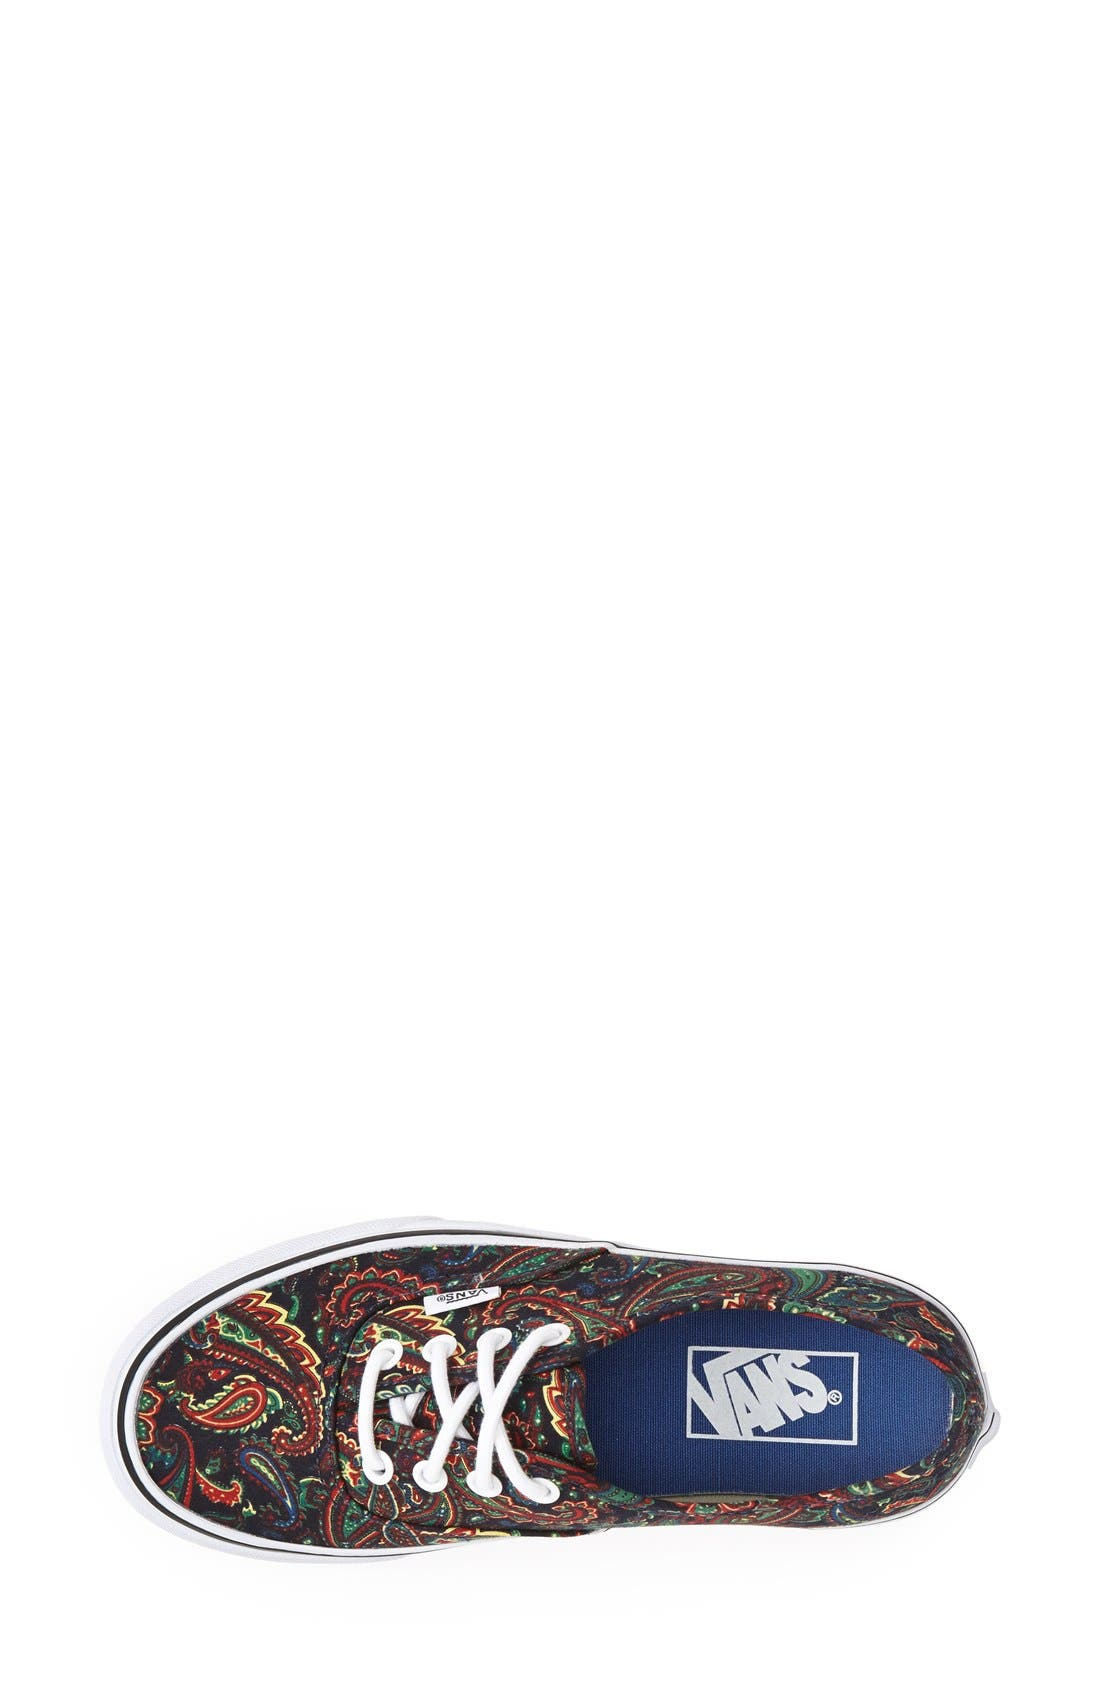 Alternate Image 3  - Vans Authentic Paisley Print Sneaker (Women)